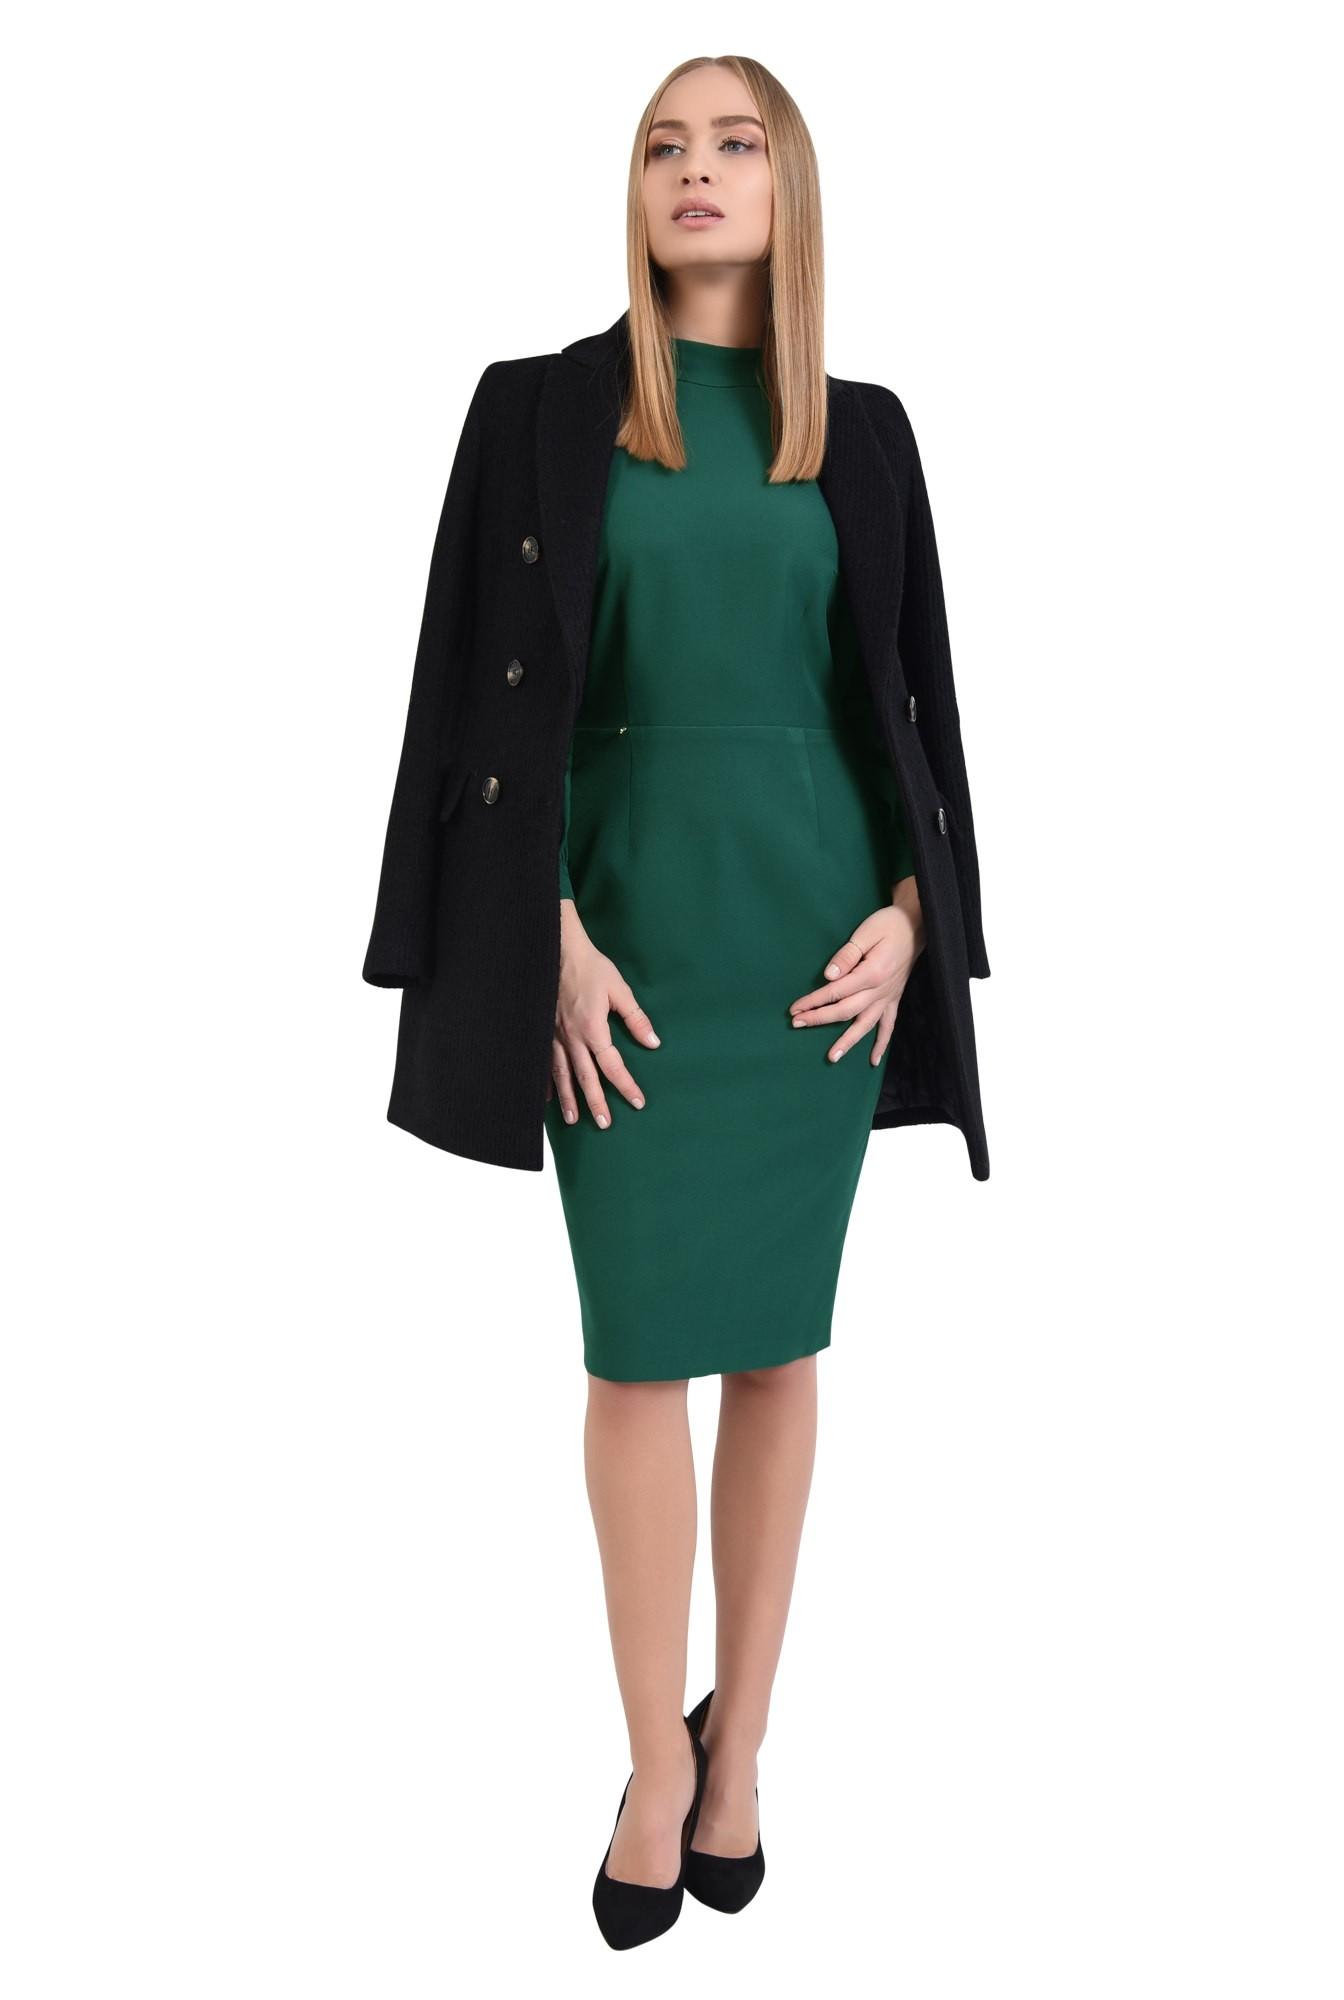 0 - palton dama, online, negru, drept, doua randuri de nasturi